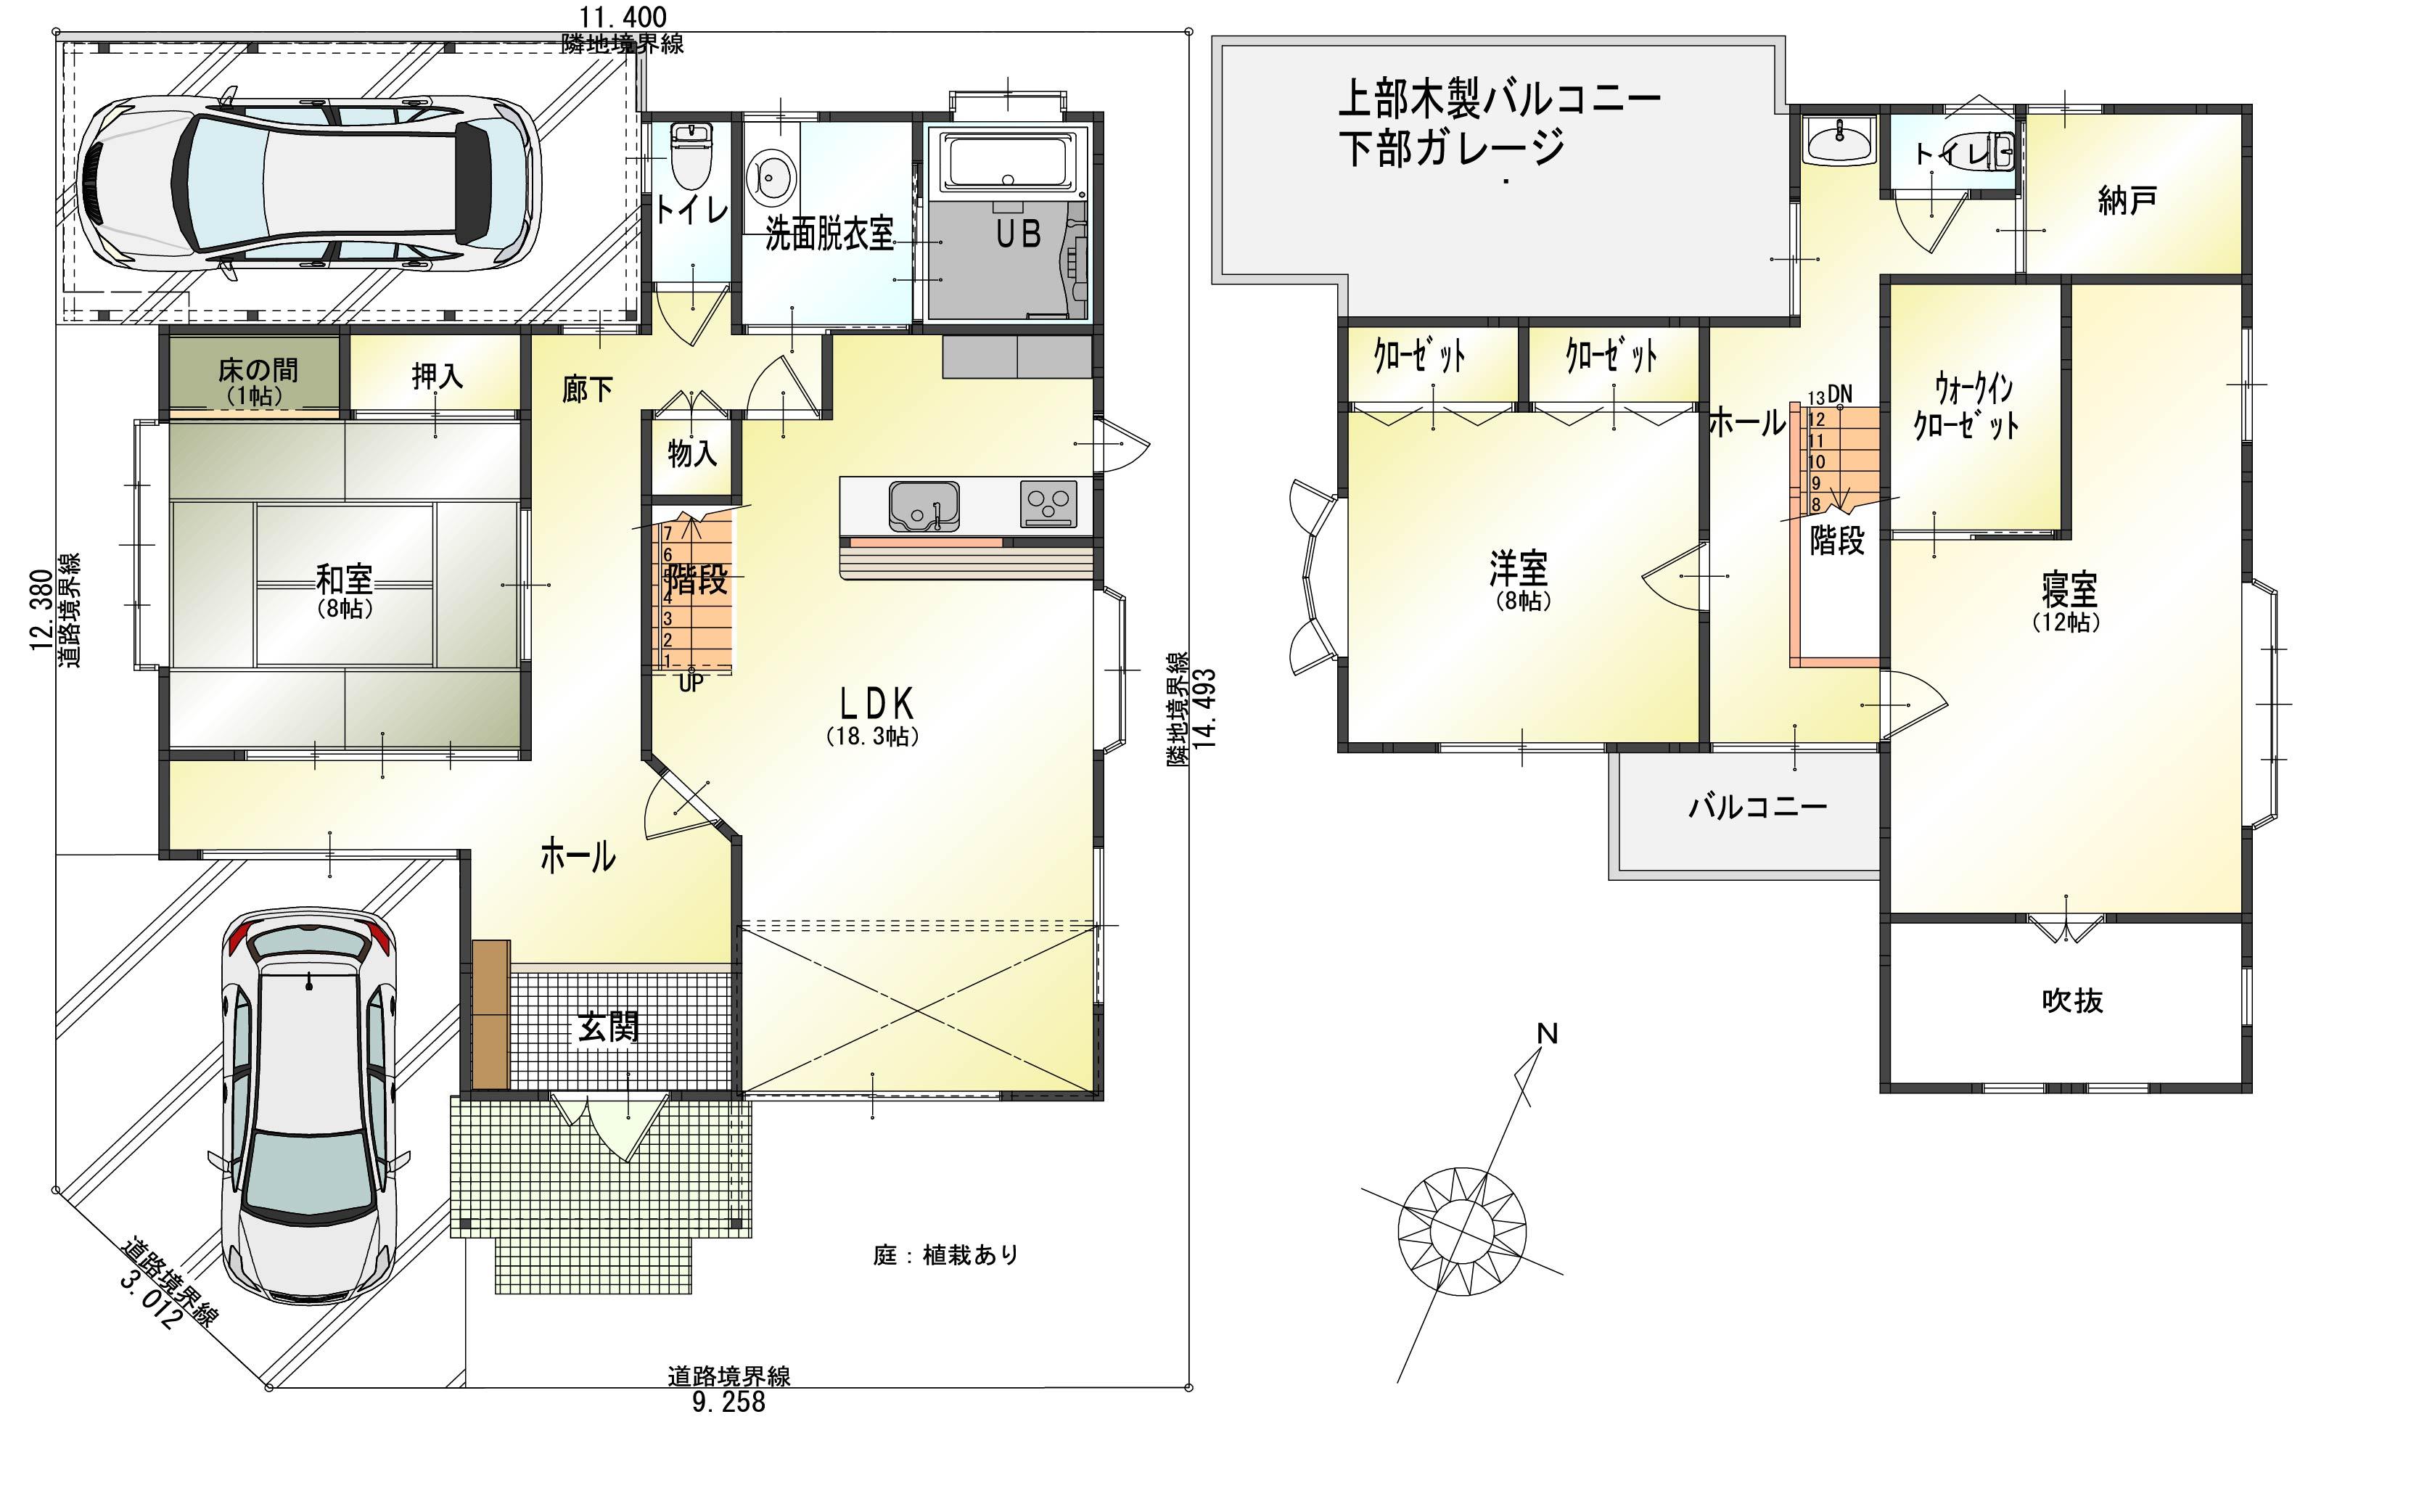 新潟市東区秋葉の【中古住宅】不動産情報の間取図